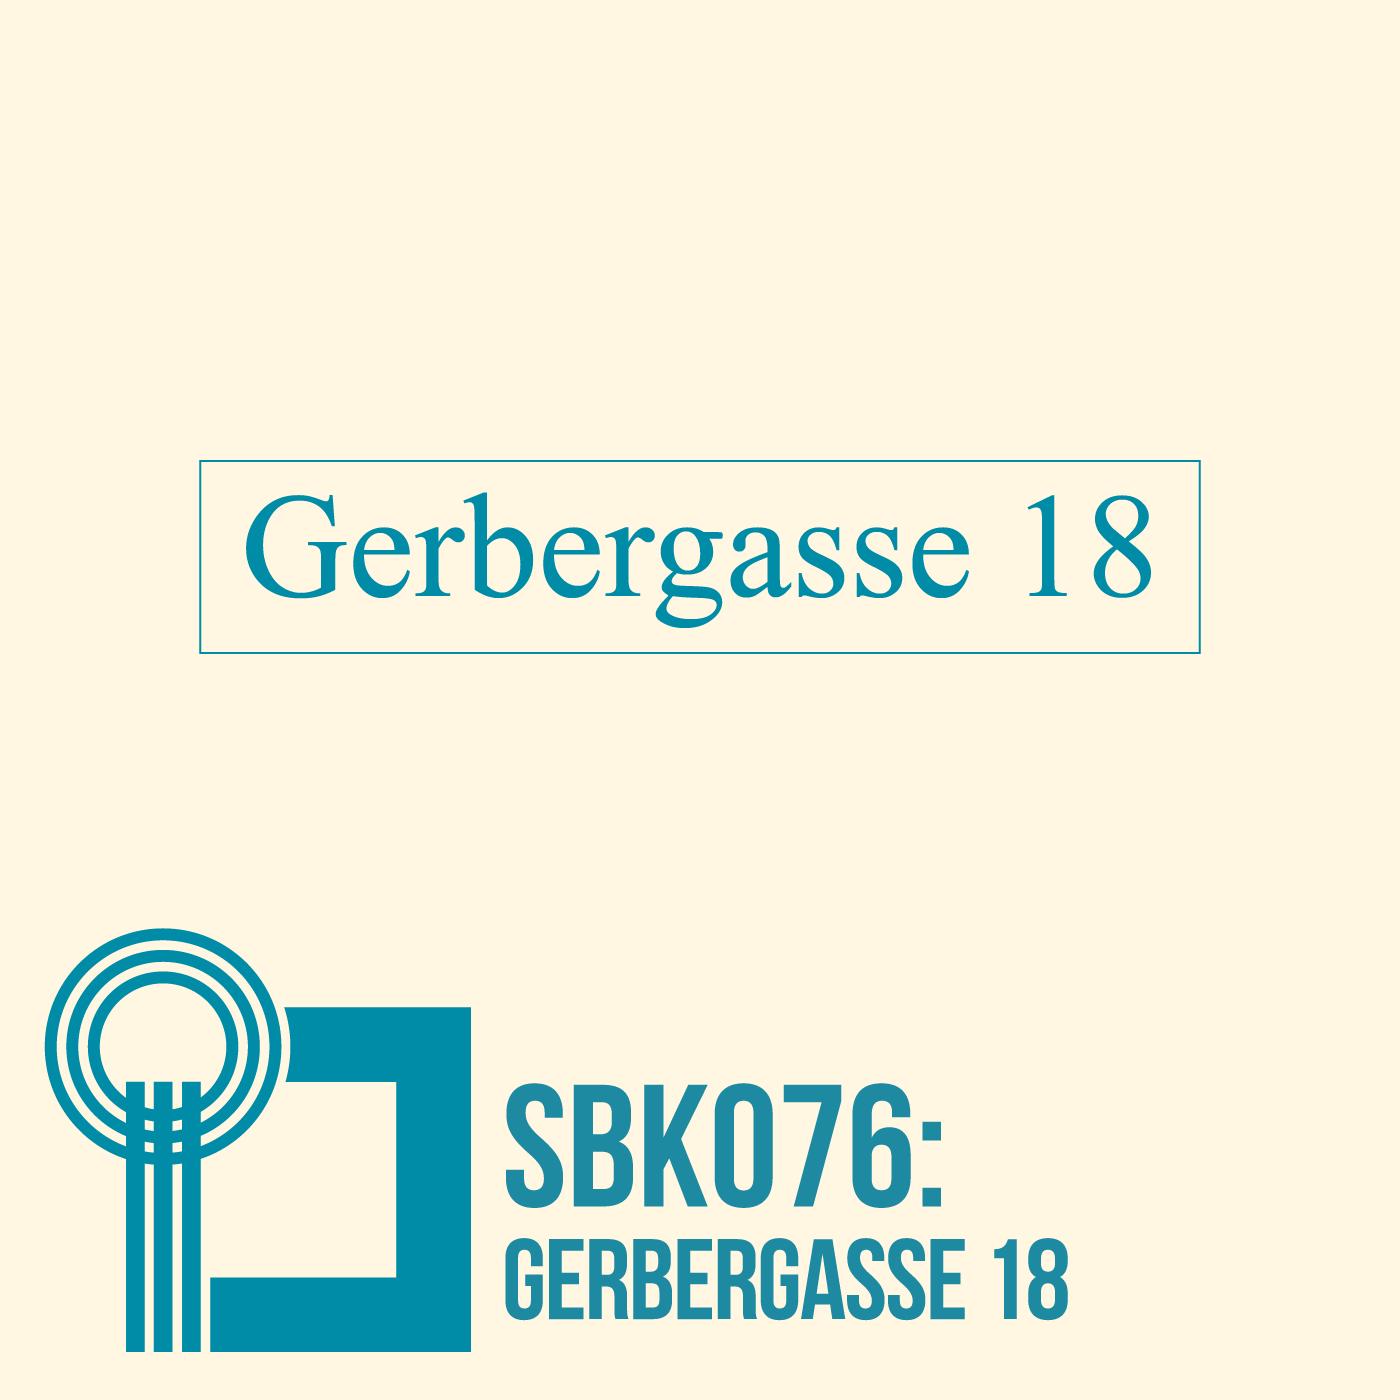 SBK076 Gerbergasse 18